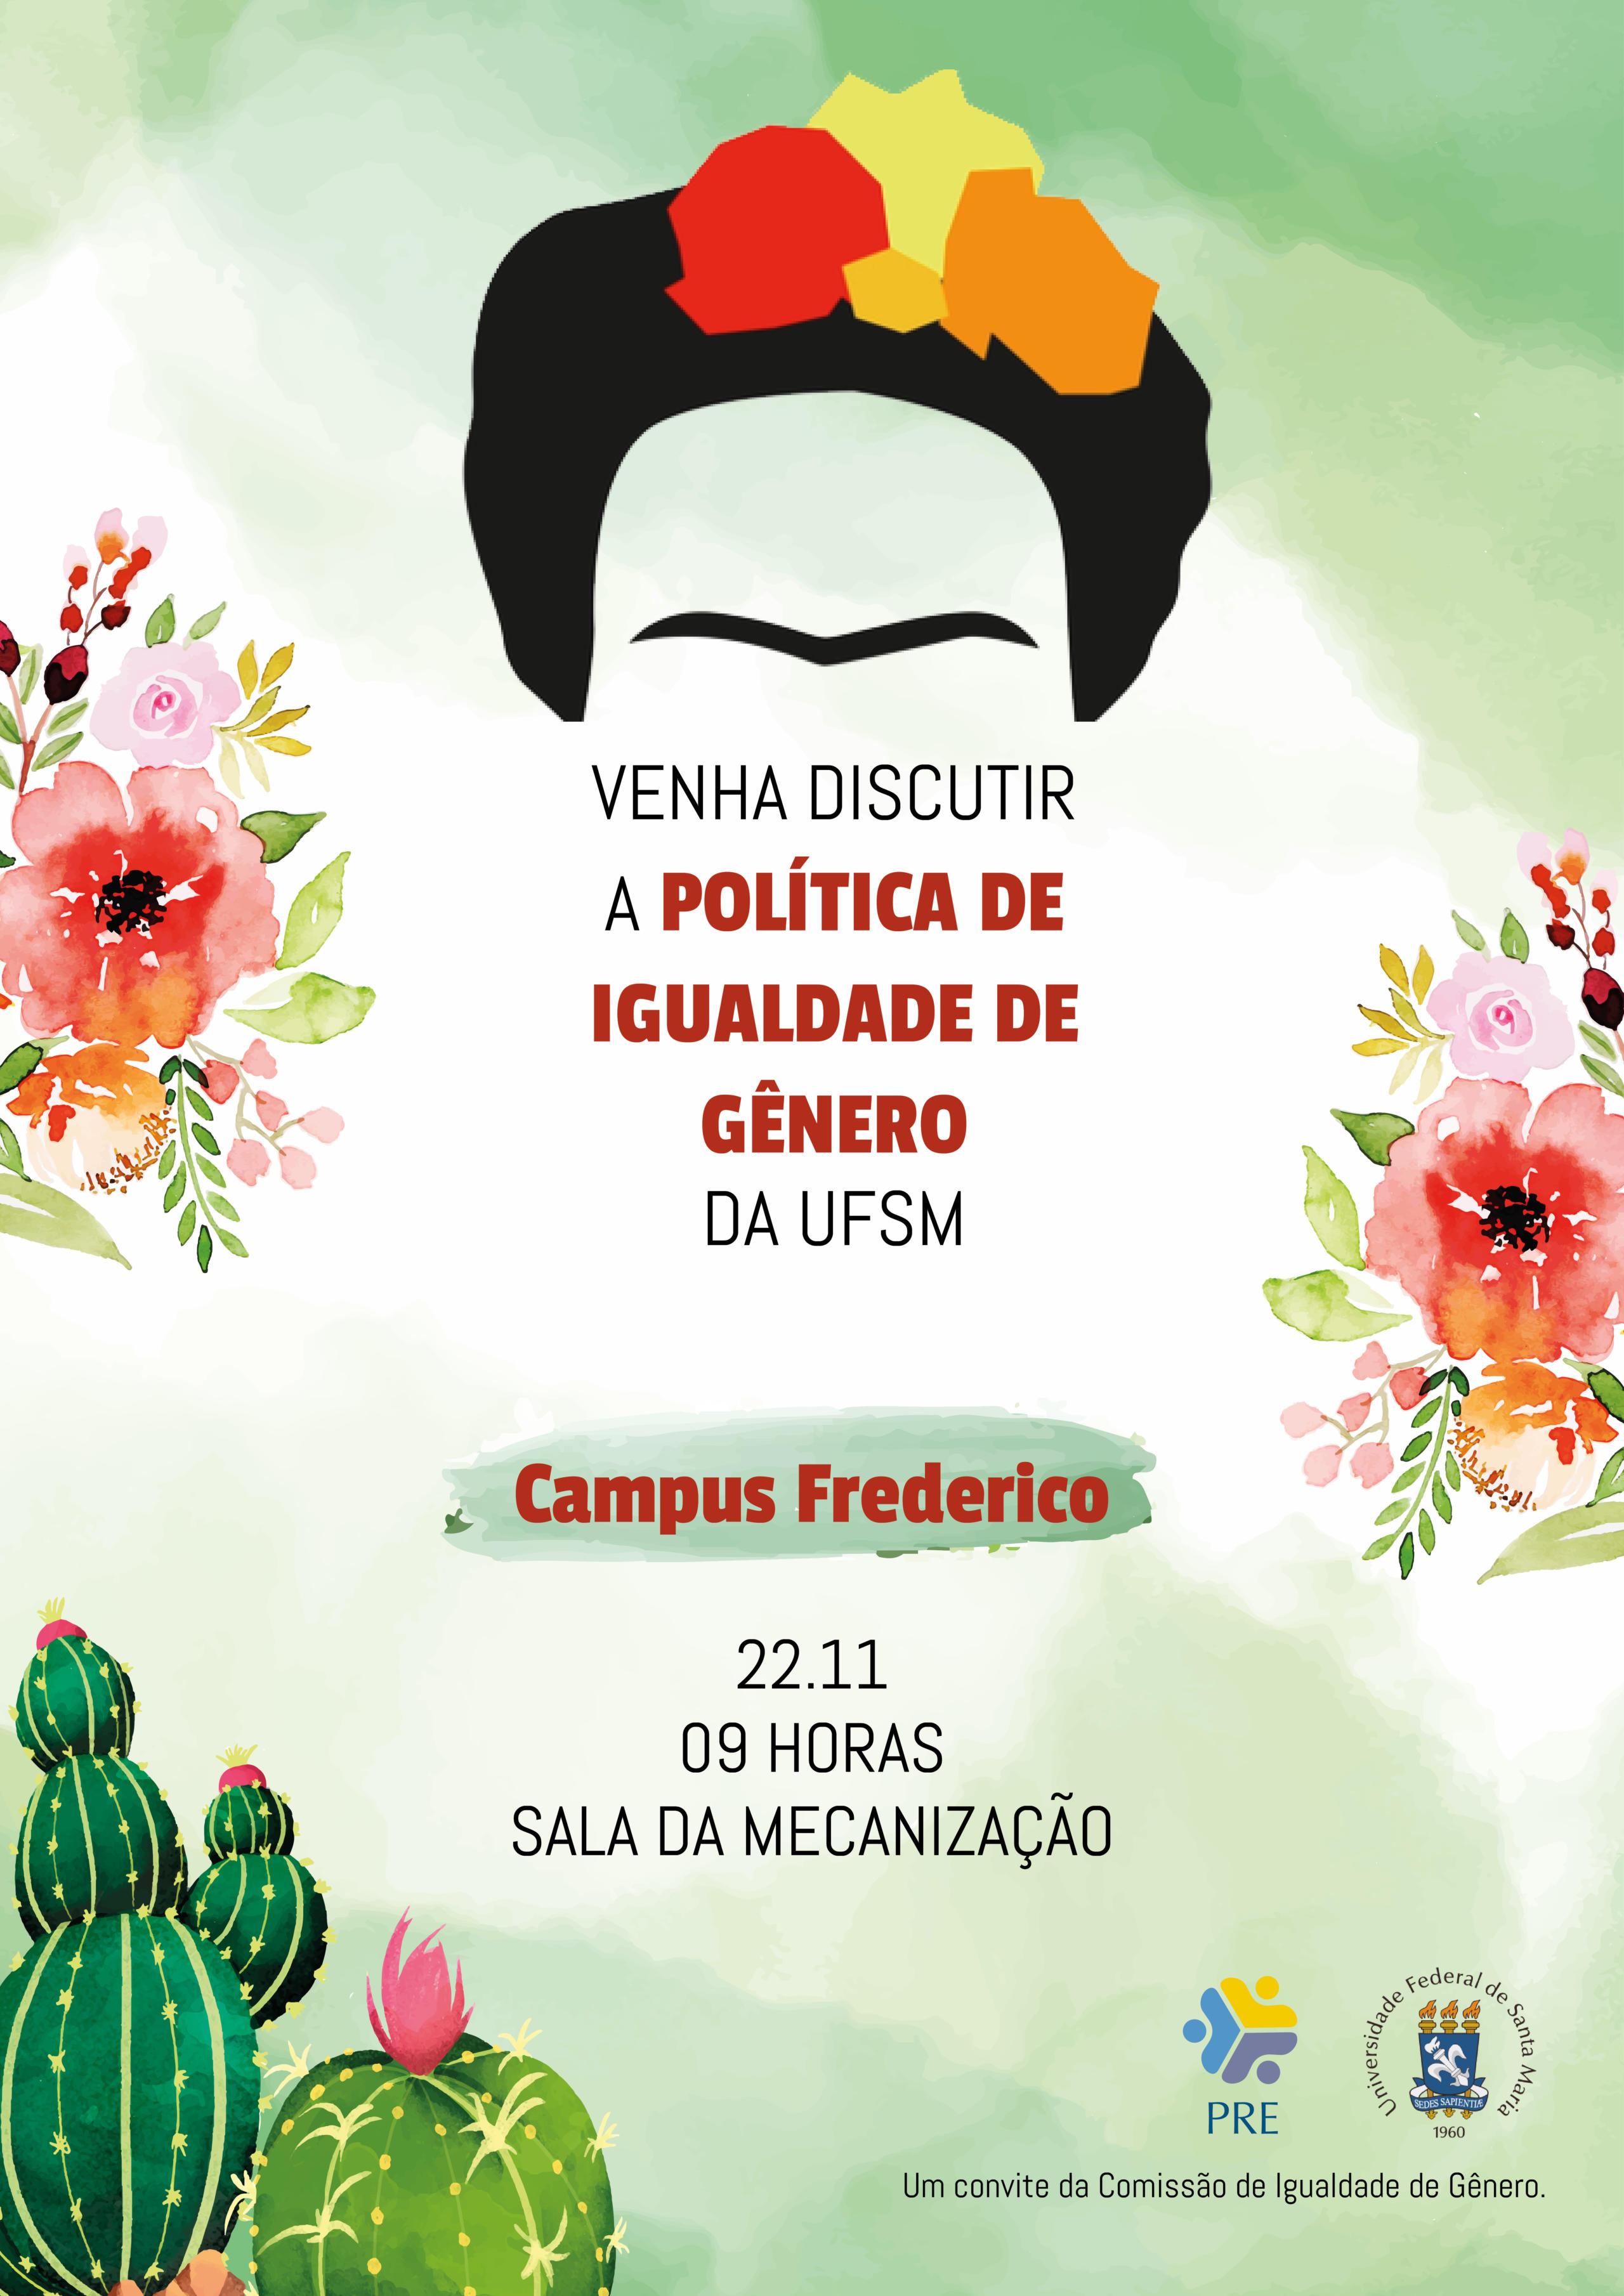 CARTAZ FRIDA FREDERICO